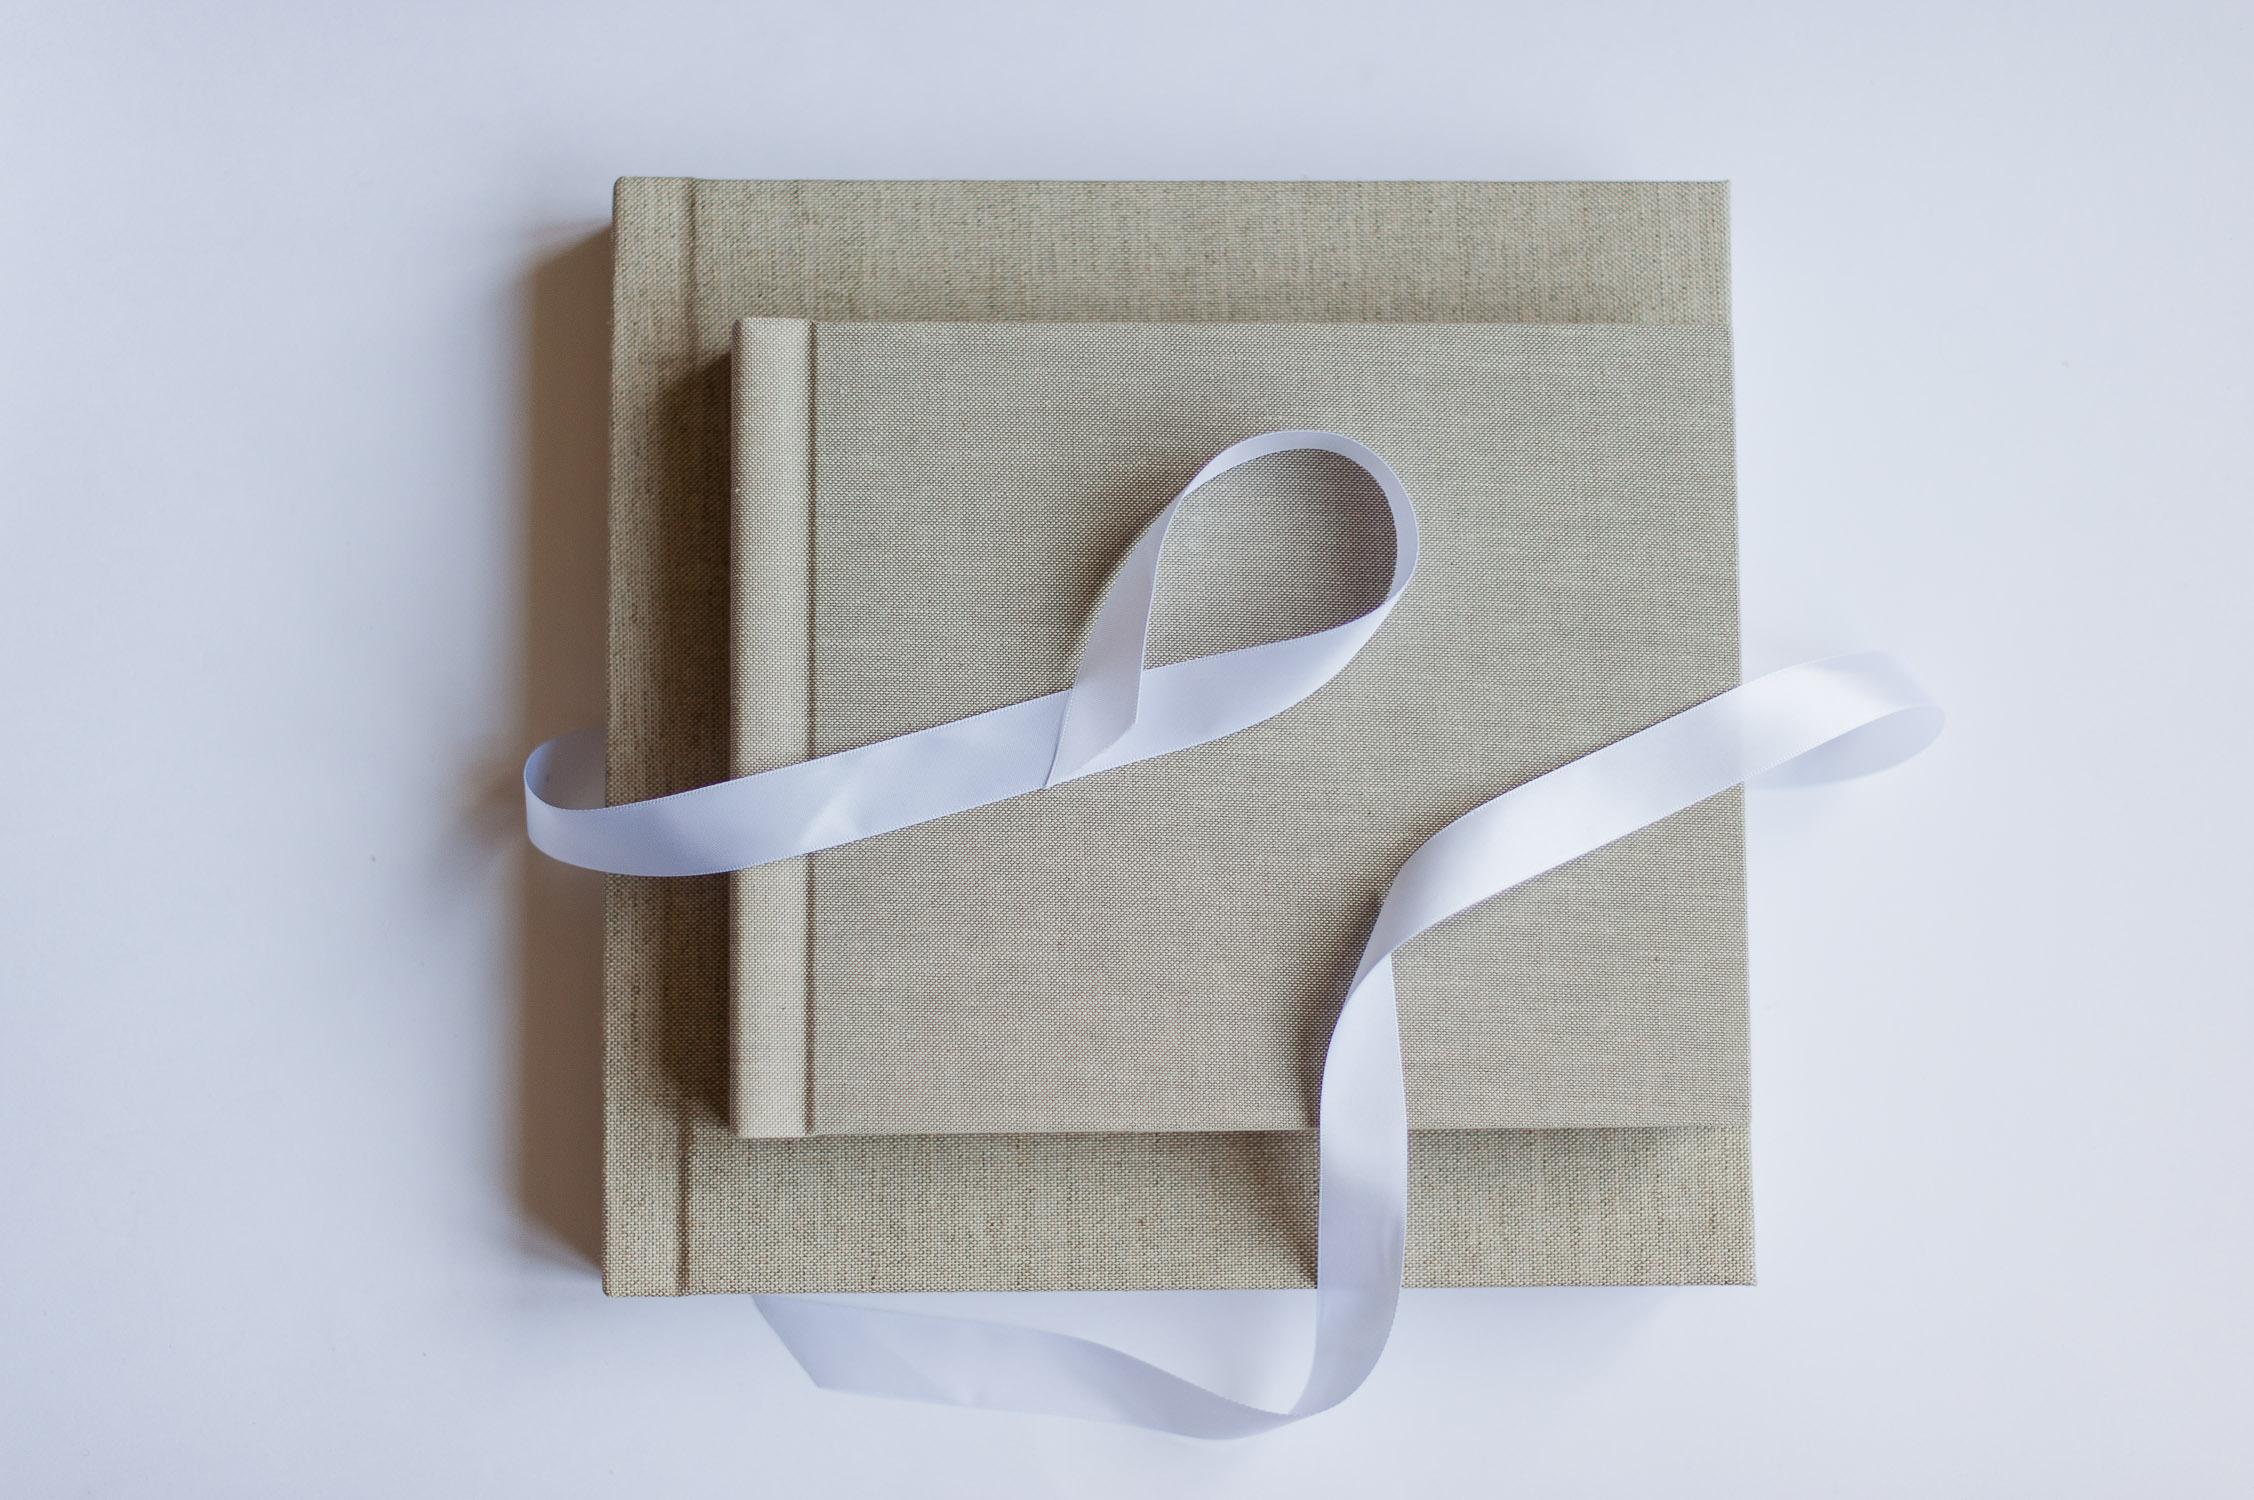 album photographie professionnel tissu lin vintage beige ruban soie gta imaging